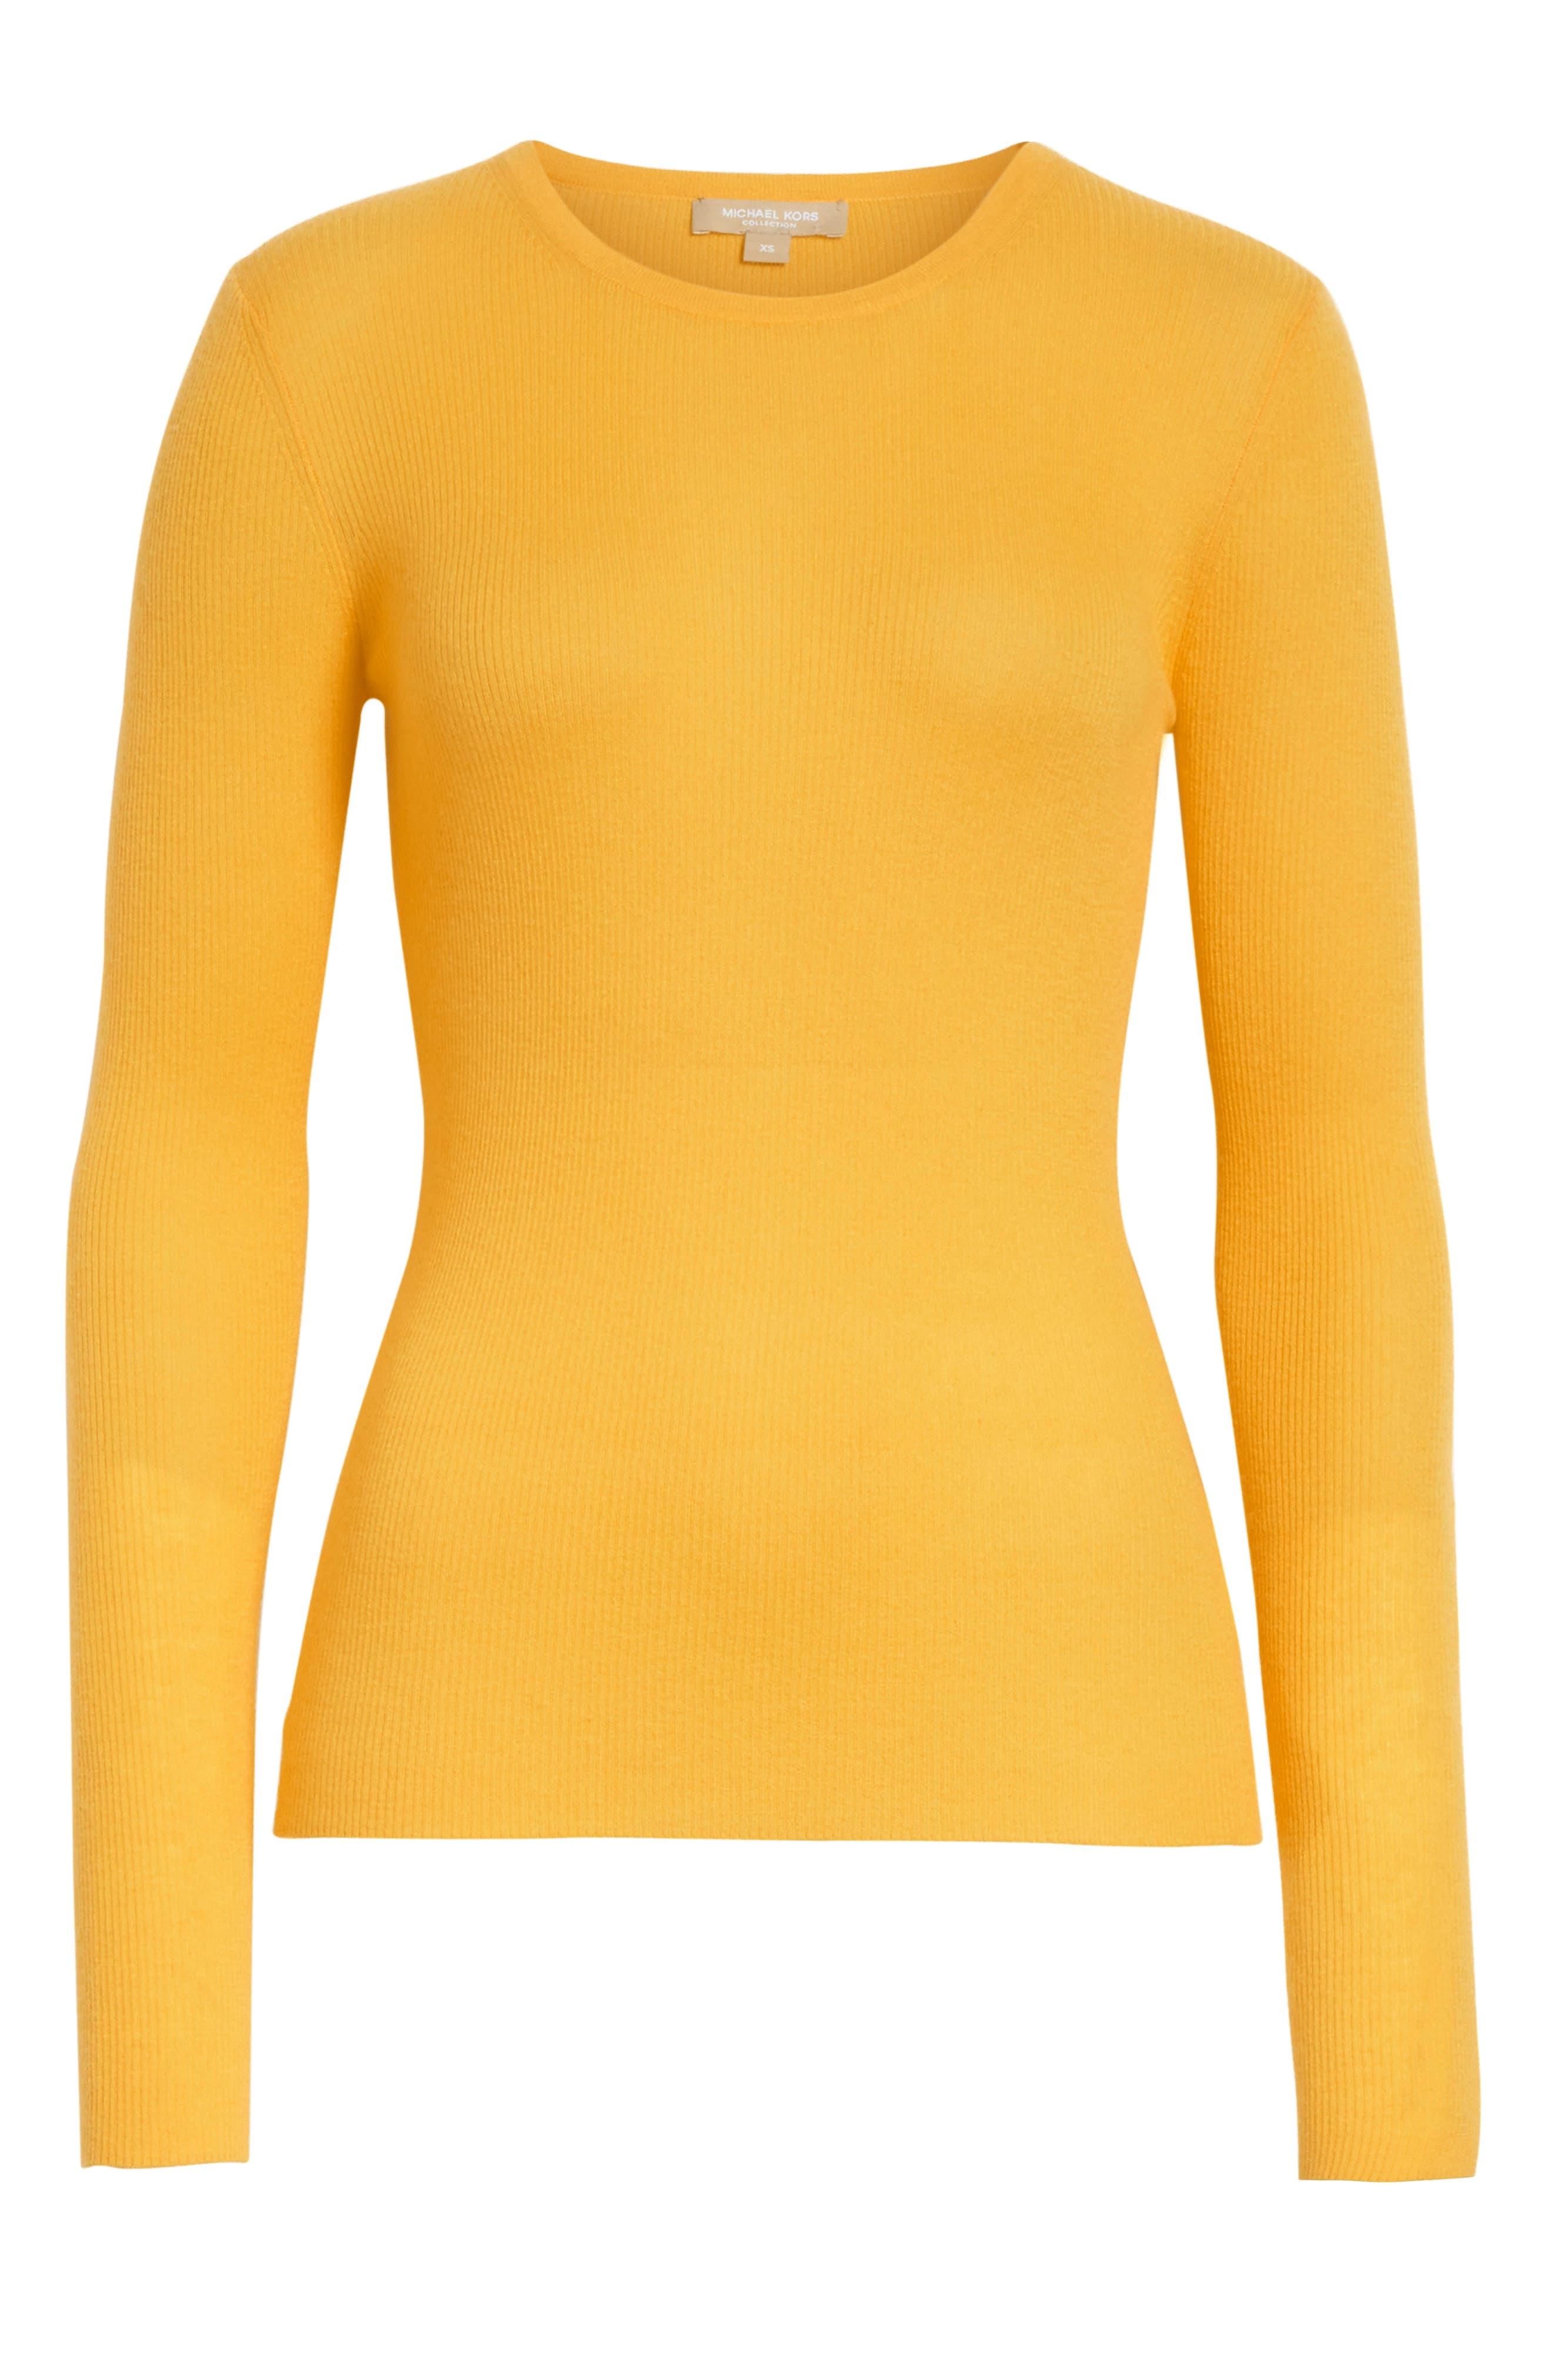 Cashmere Crewneck Sweater,                             Alternate thumbnail 6, color,                             110